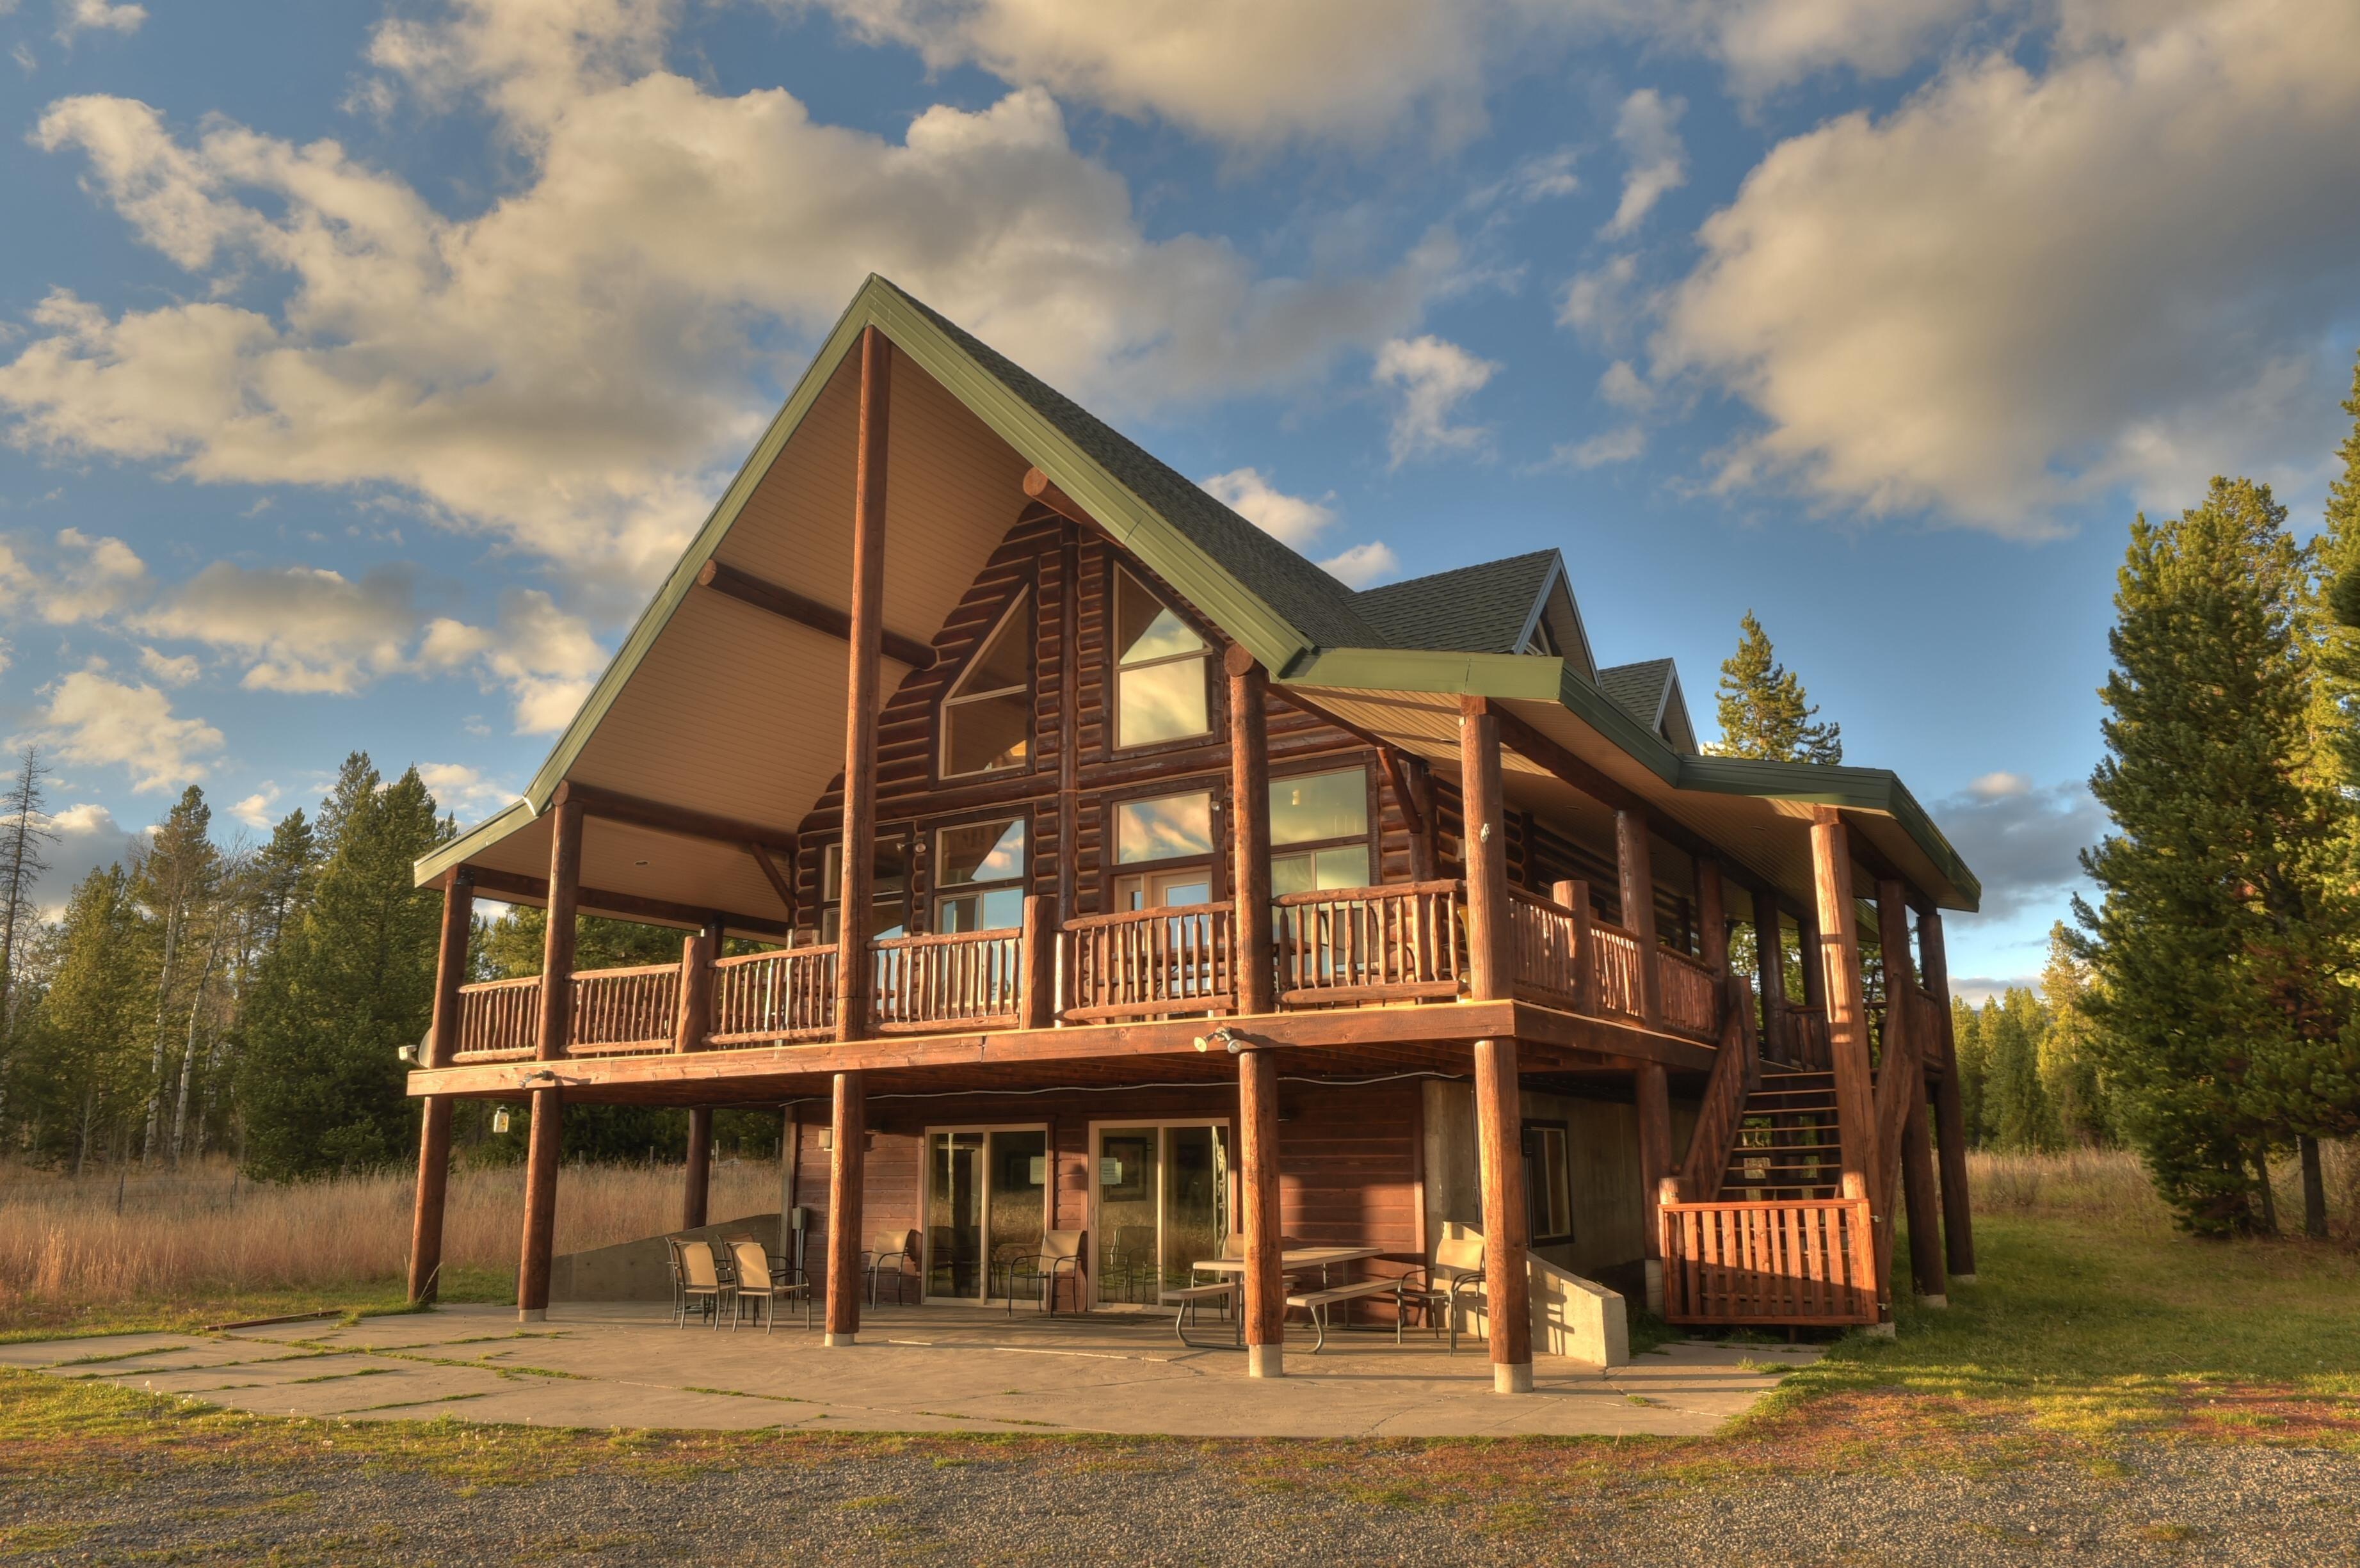 Outland Meadows Island Park Yellowstone Cabin Yellowstone Cabins Yellowstone Cabin Rentals Island Park